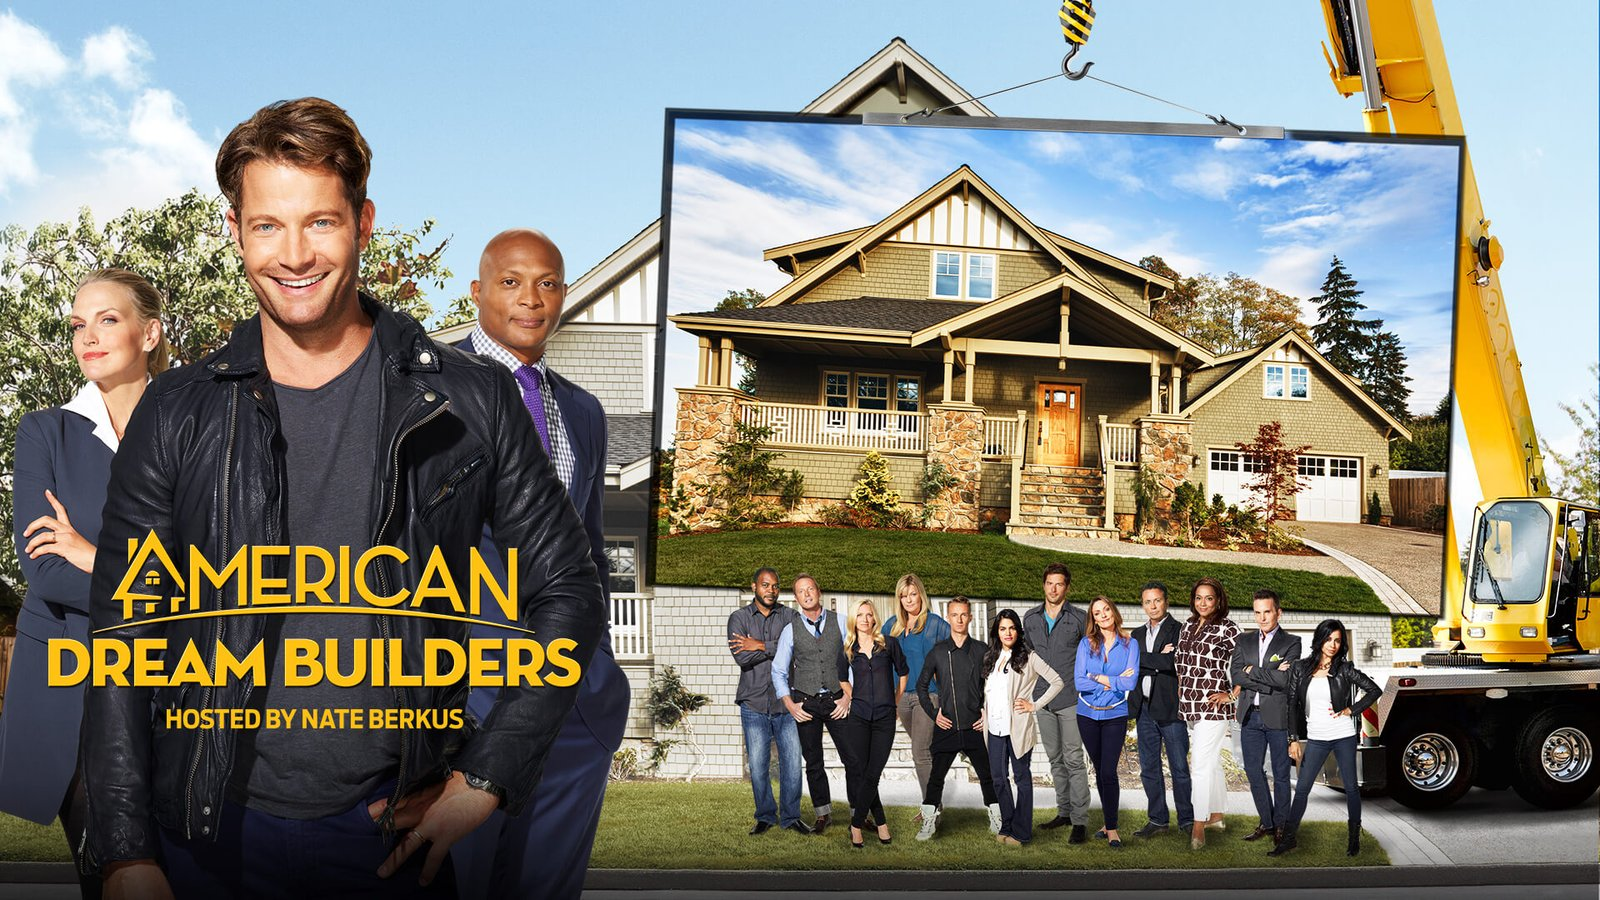 american dream builders image